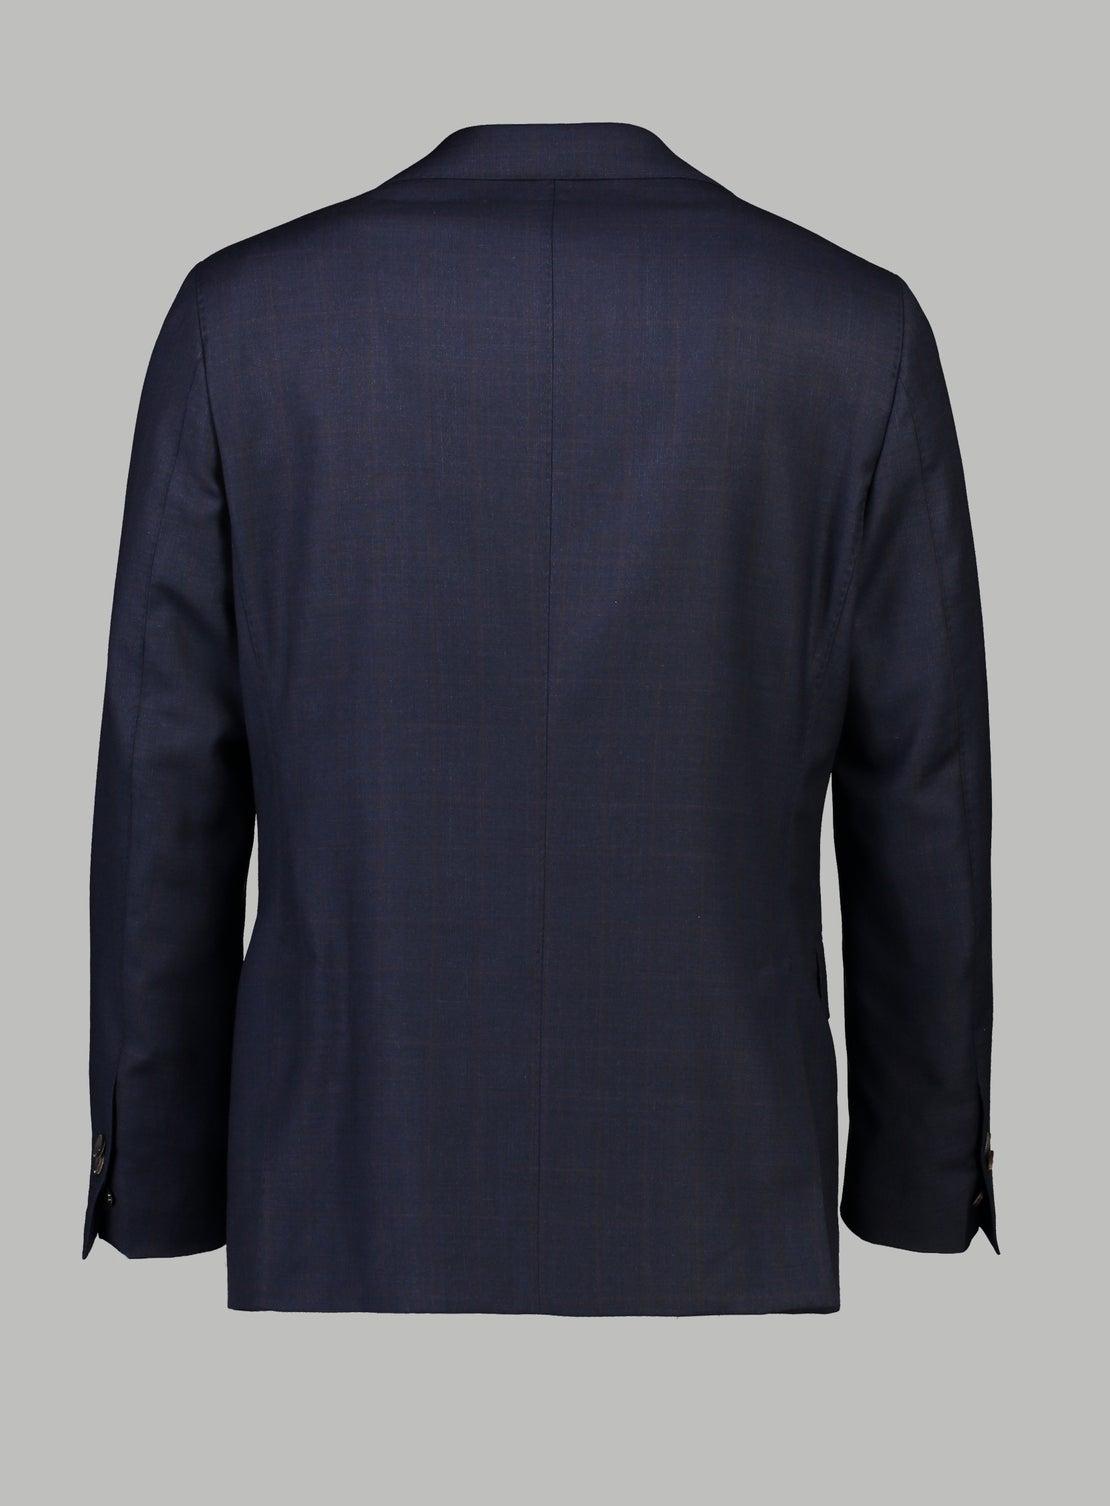 Lee Windowpane Check Suit